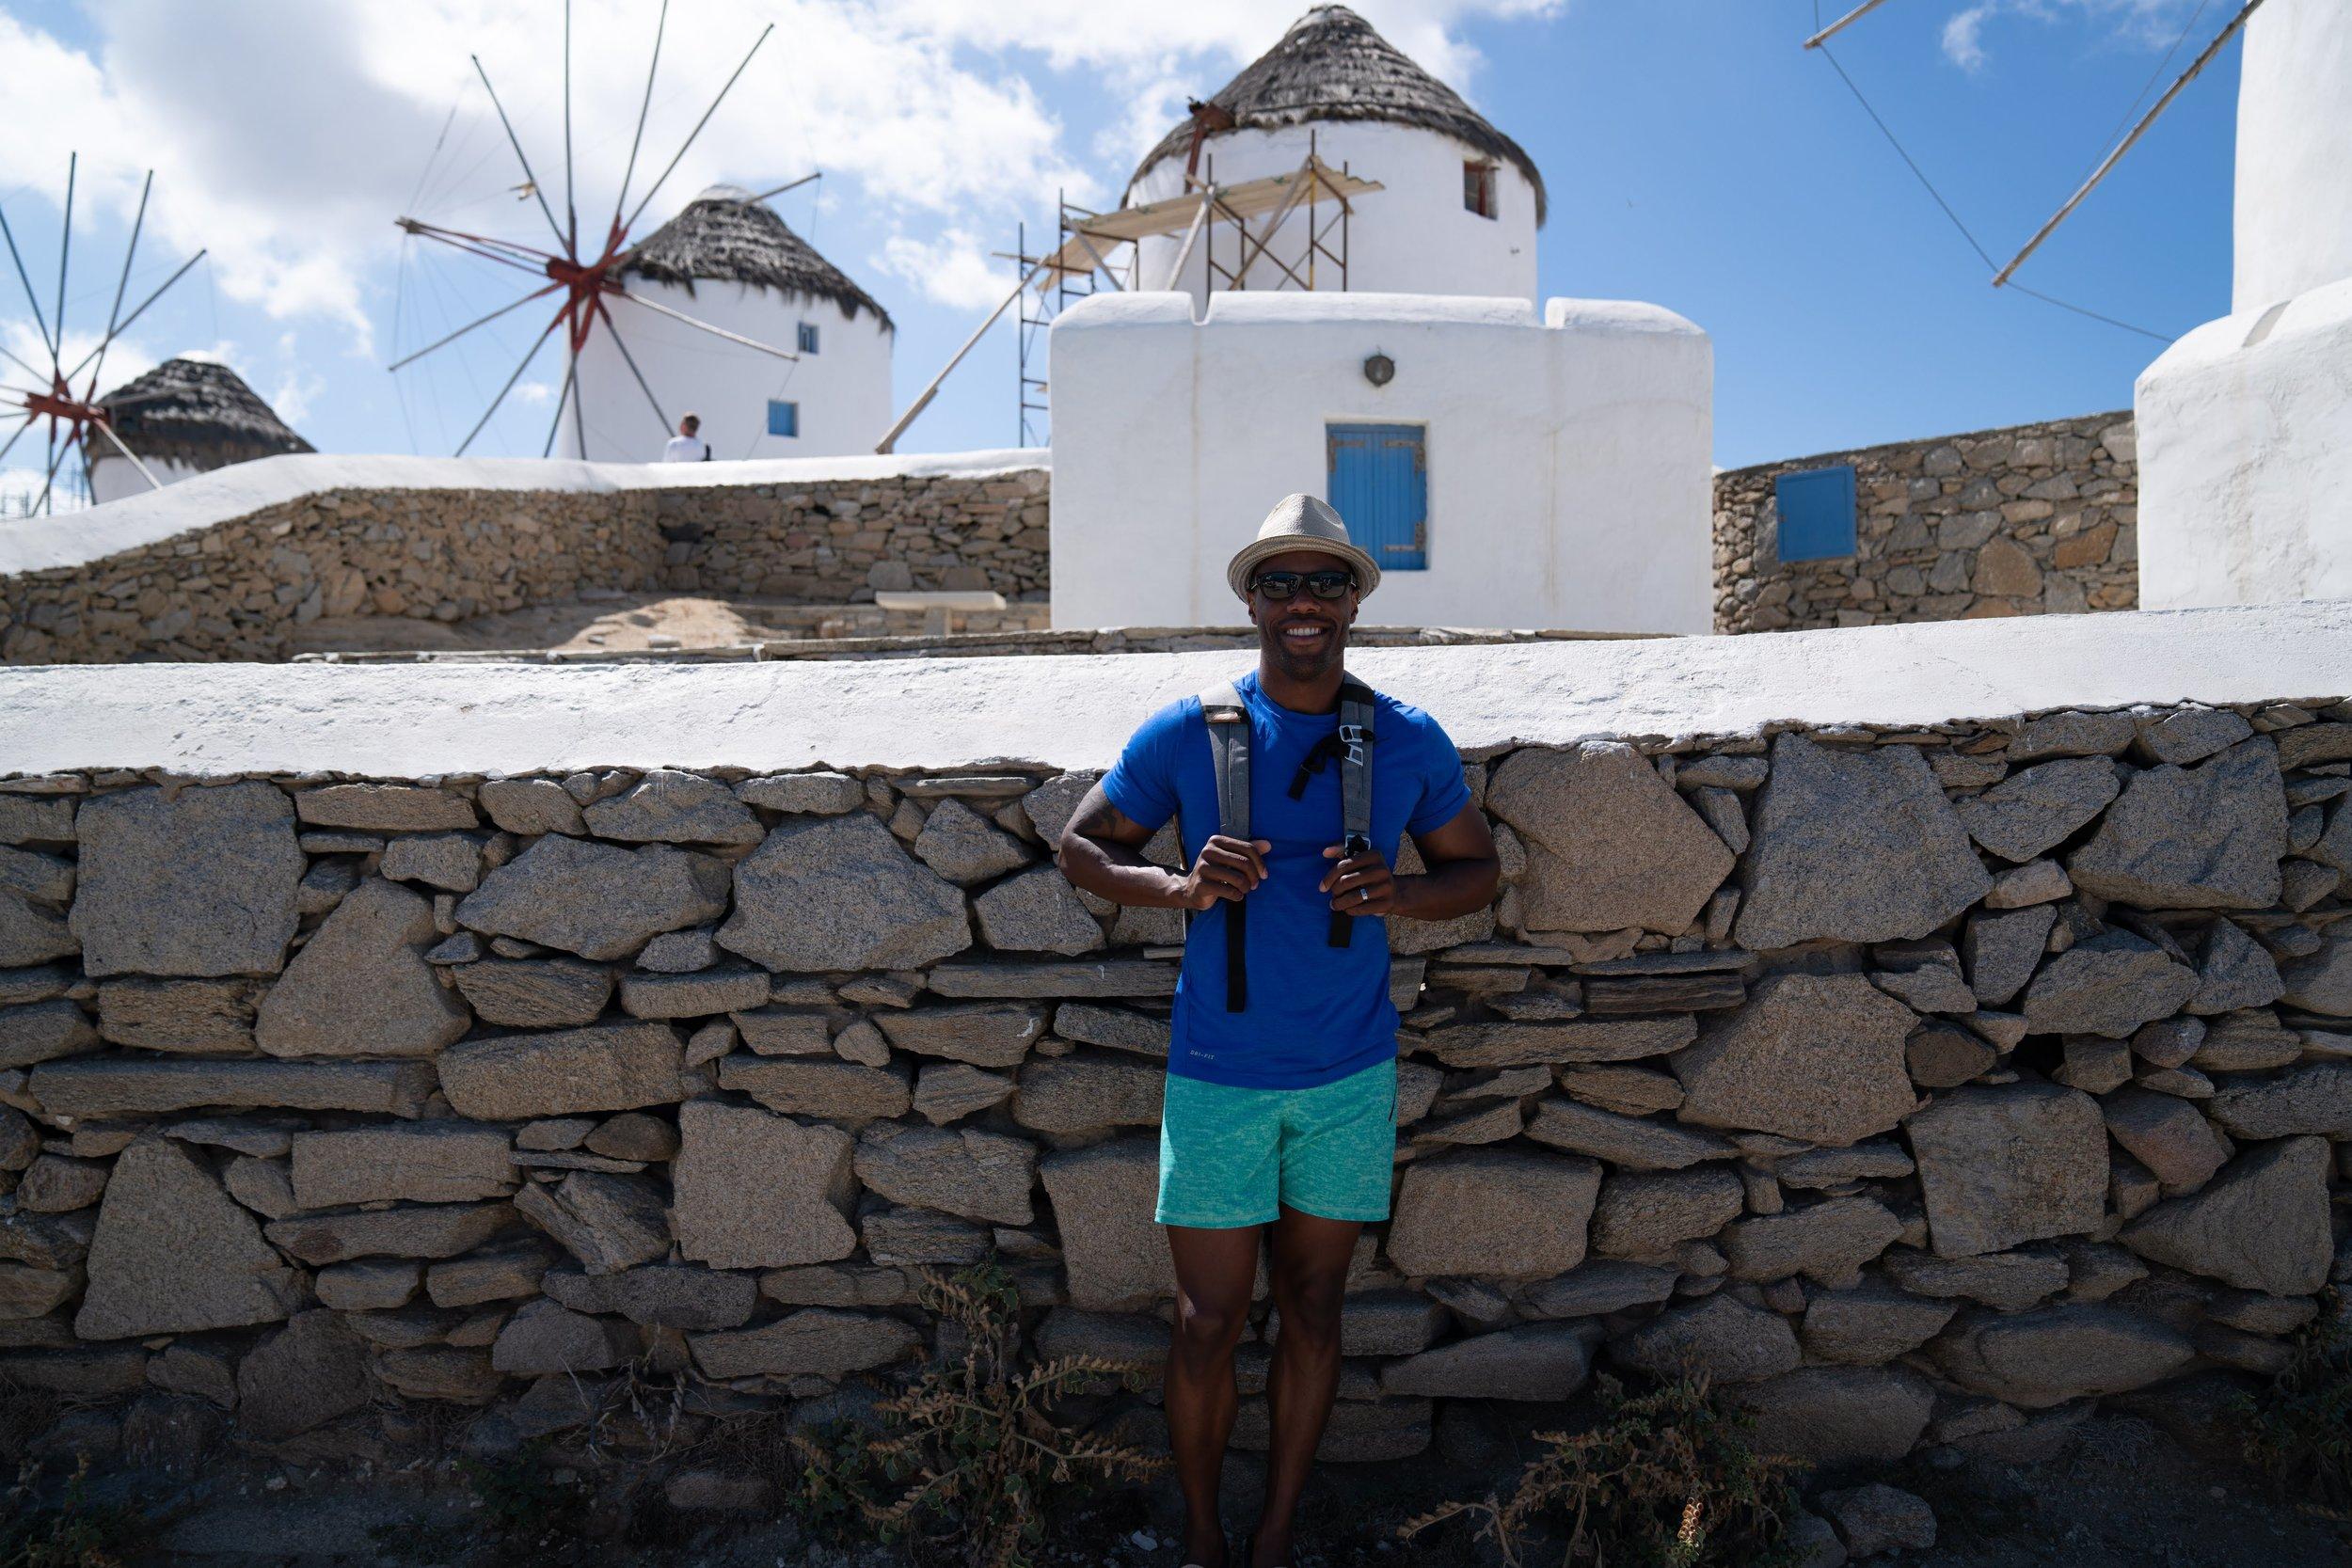 Shorts: Lululemon// Hat: Ben Sherman// Backpack: Peak Design // Sunglasses: Maui Jim